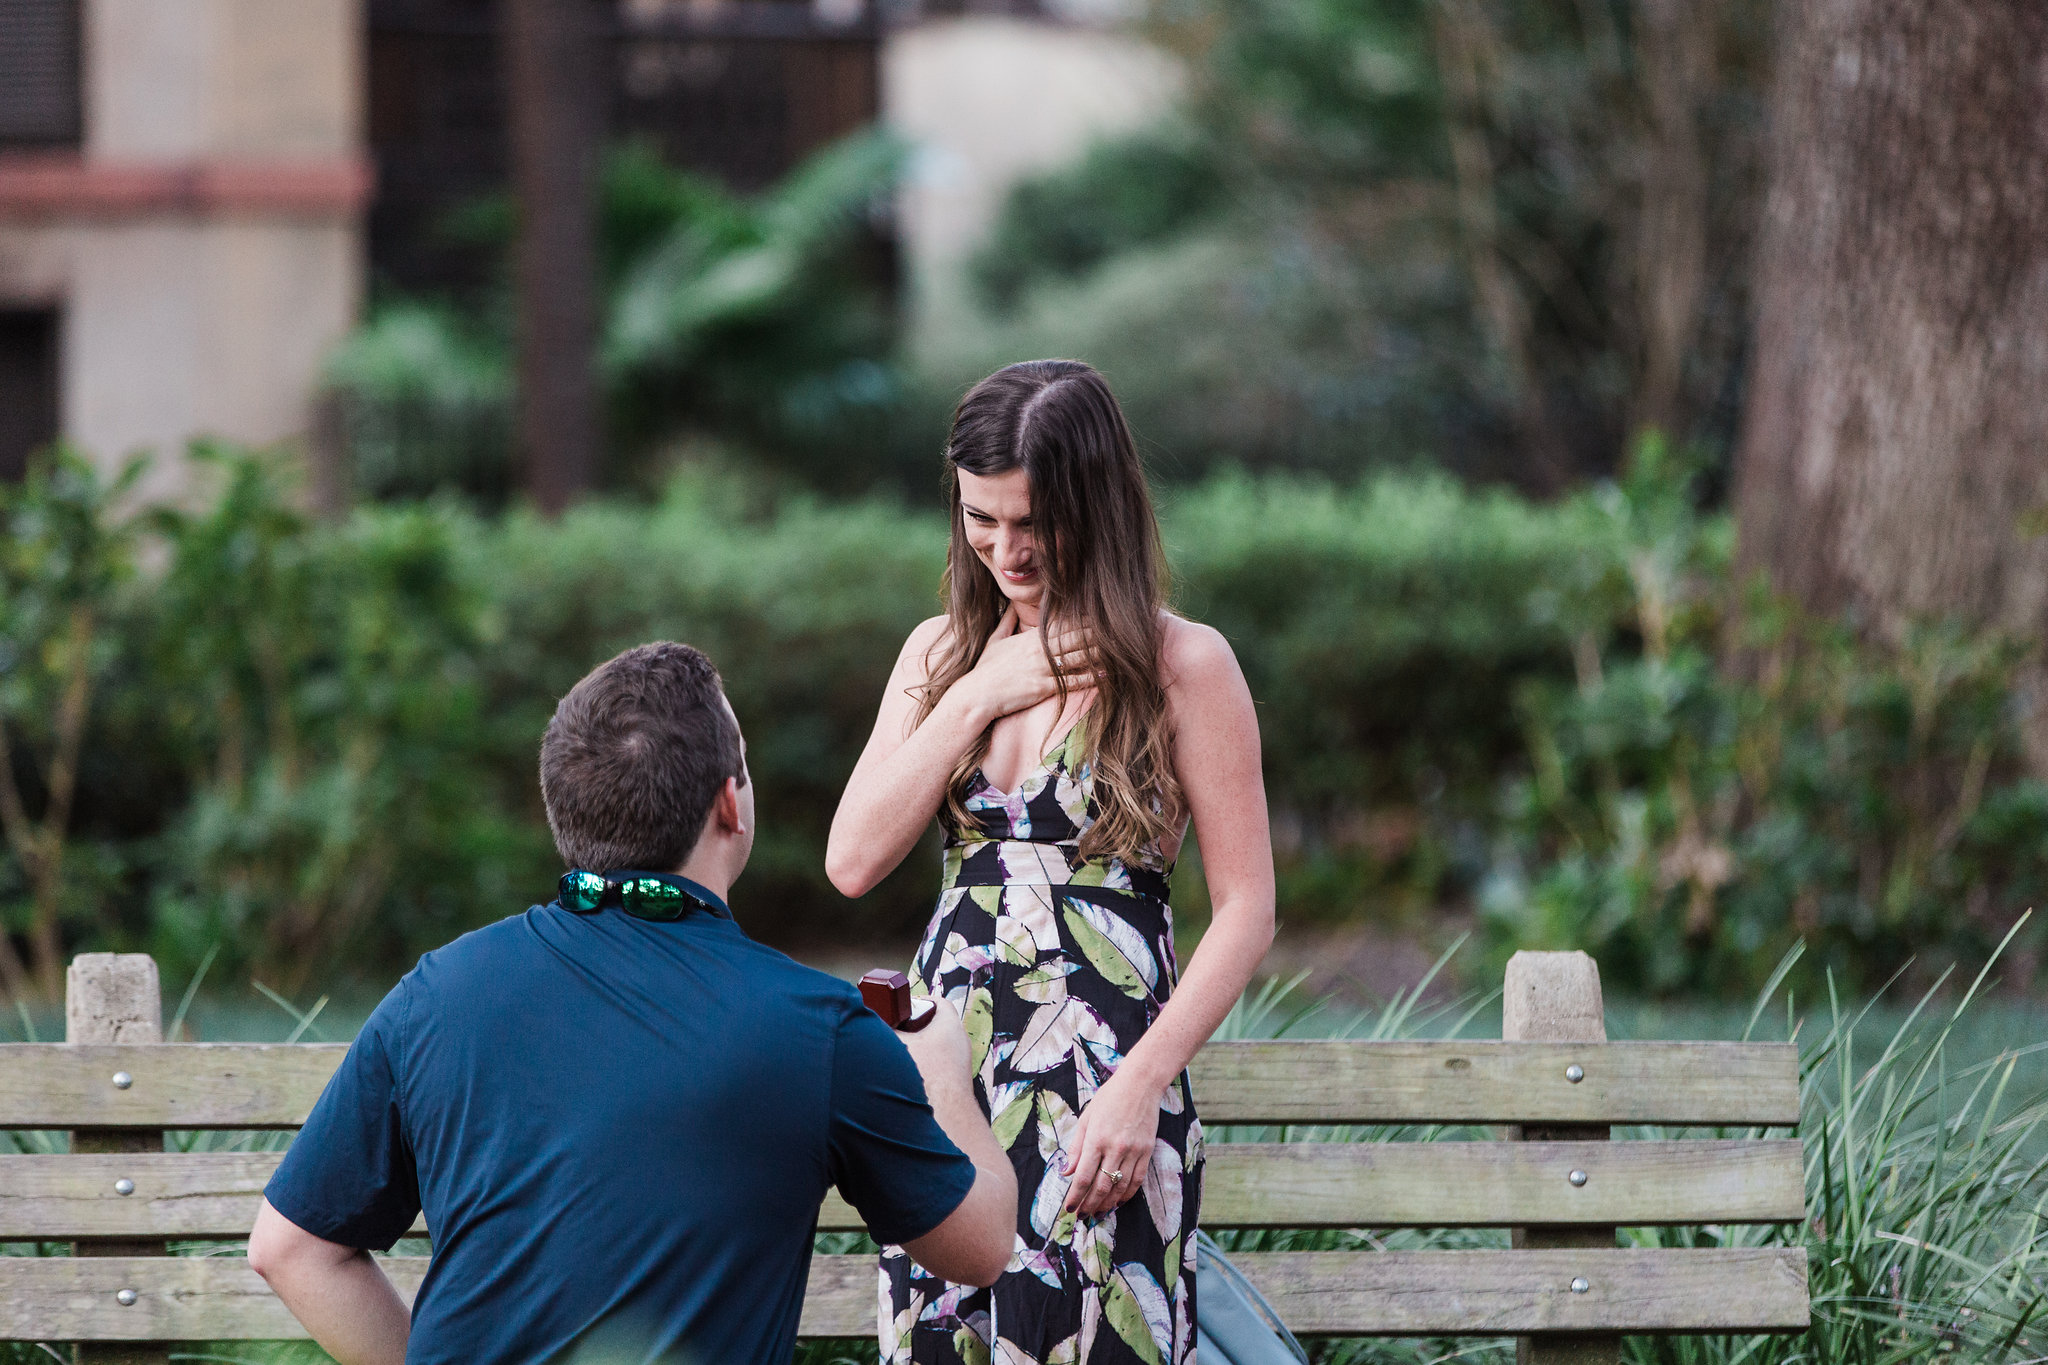 Apt-b-photography-savannah-wedding-photographer-savannah-wedding-lowcountry-wedding-georgia-wedding-savannah-engagement-engagement-photographer-surprise-engagement-photographer-savannah-squares-3.jpg